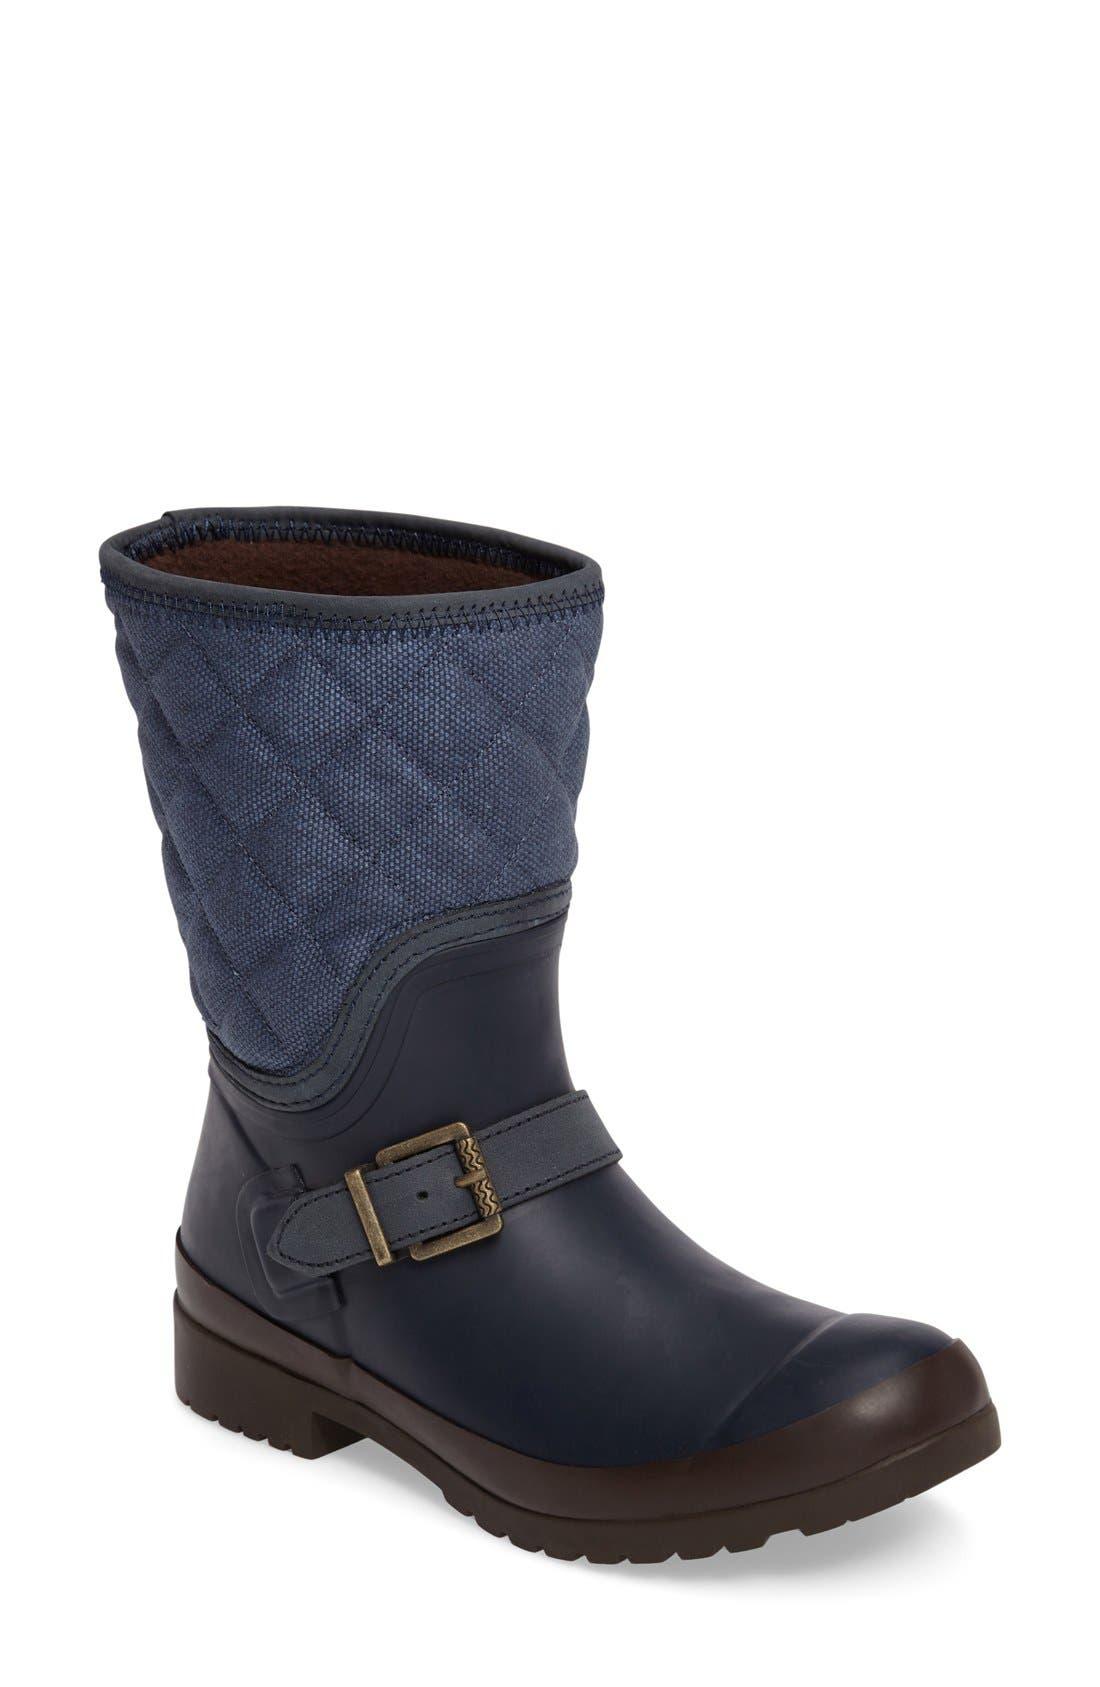 Main Image - Sperry Walker Gray Canvas Quilt Boot (Women)